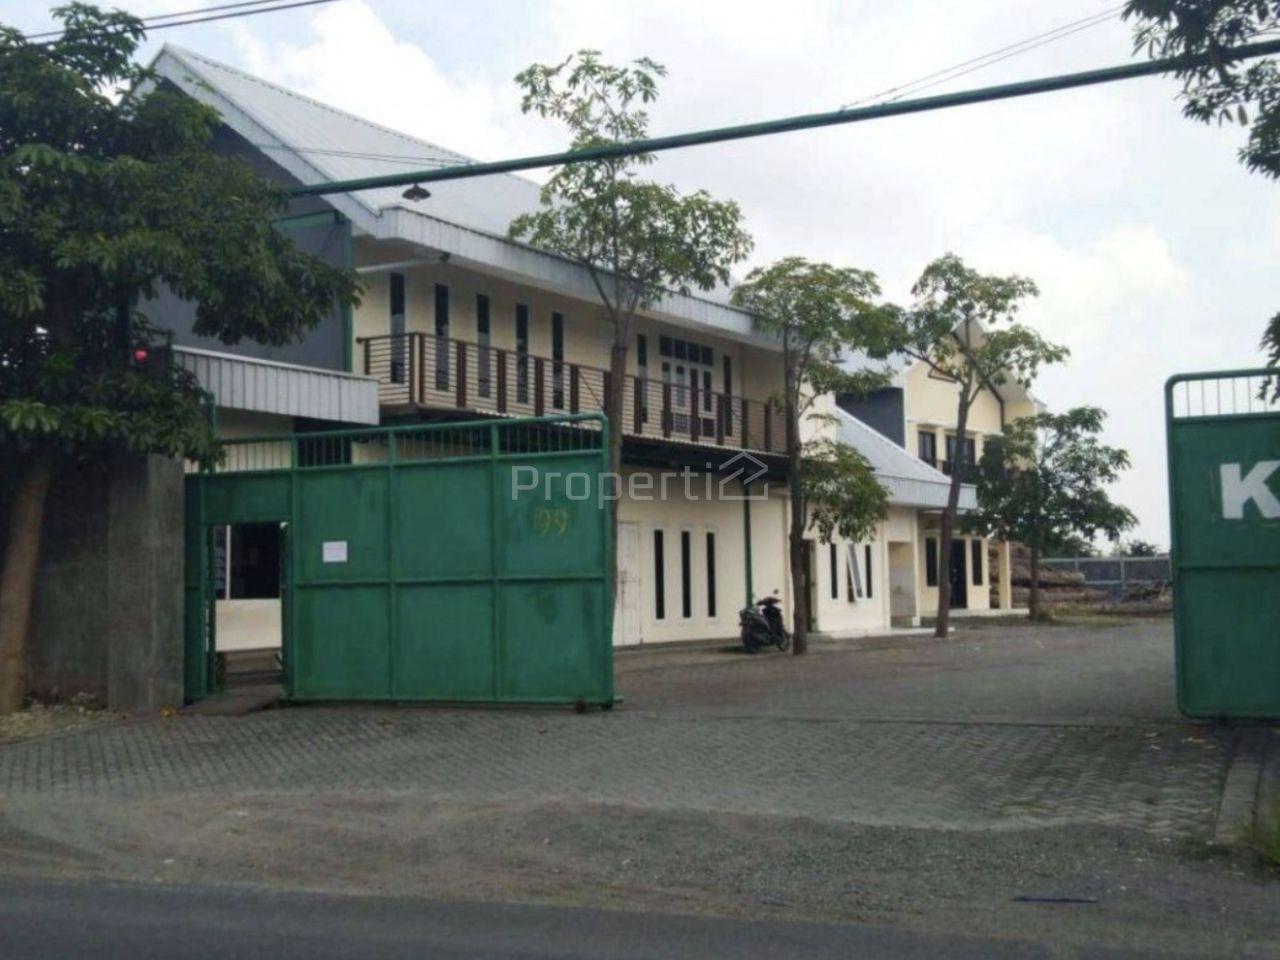 Gudang Pabrik di Jl. Raya Cerme, Gresik, Jawa Timur